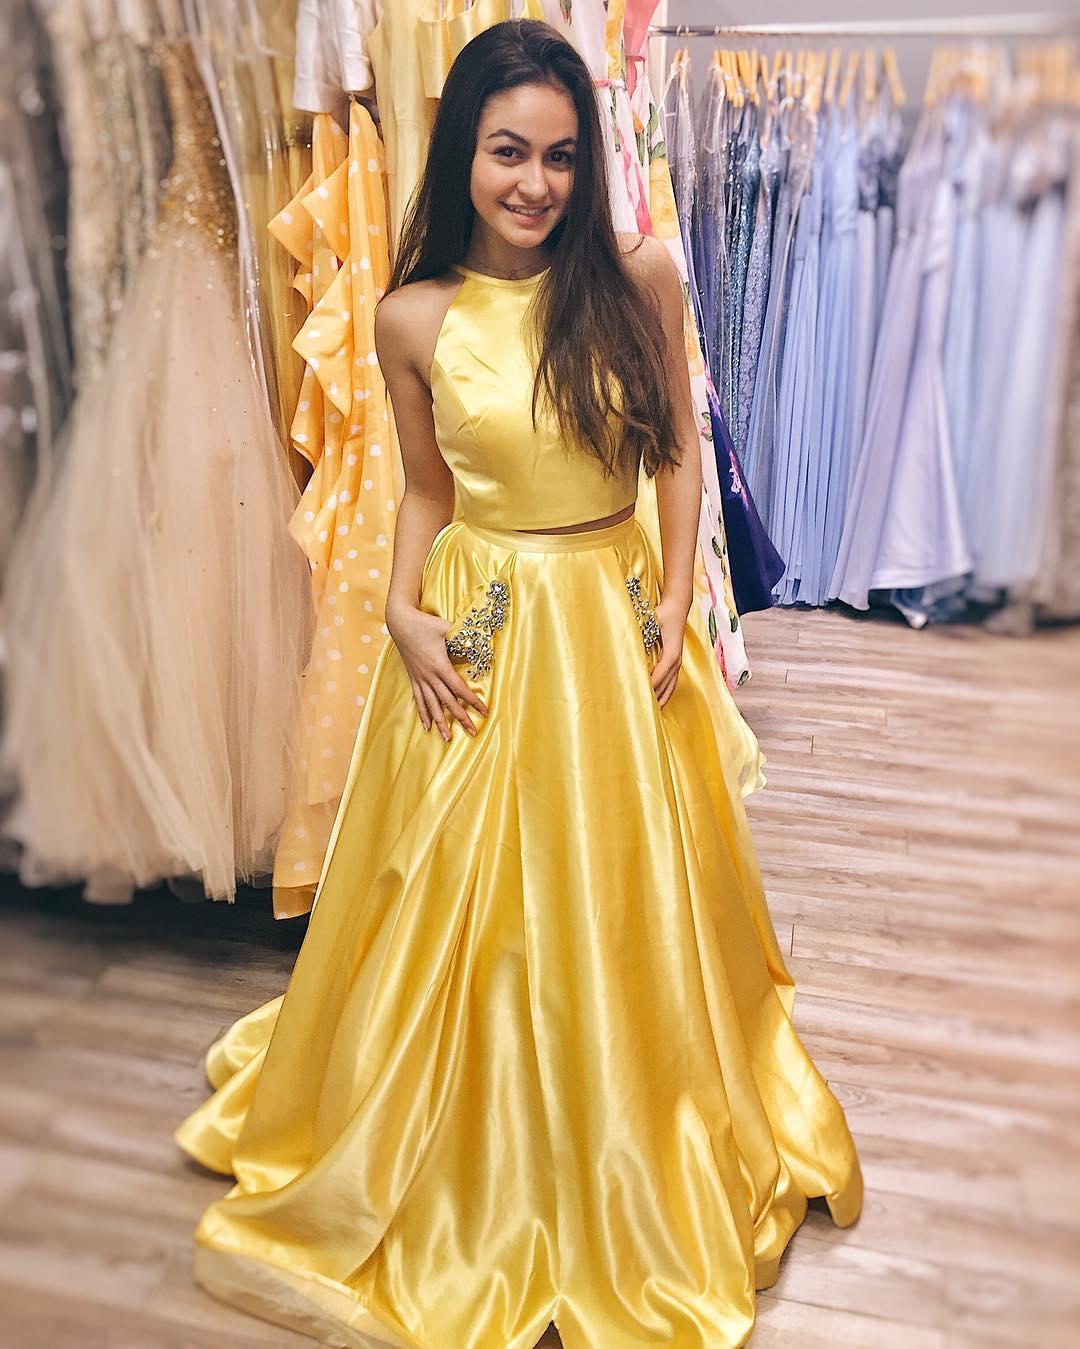 Elegant Two Piece Yellow Long Prom Dress with Pockets · modsele ...